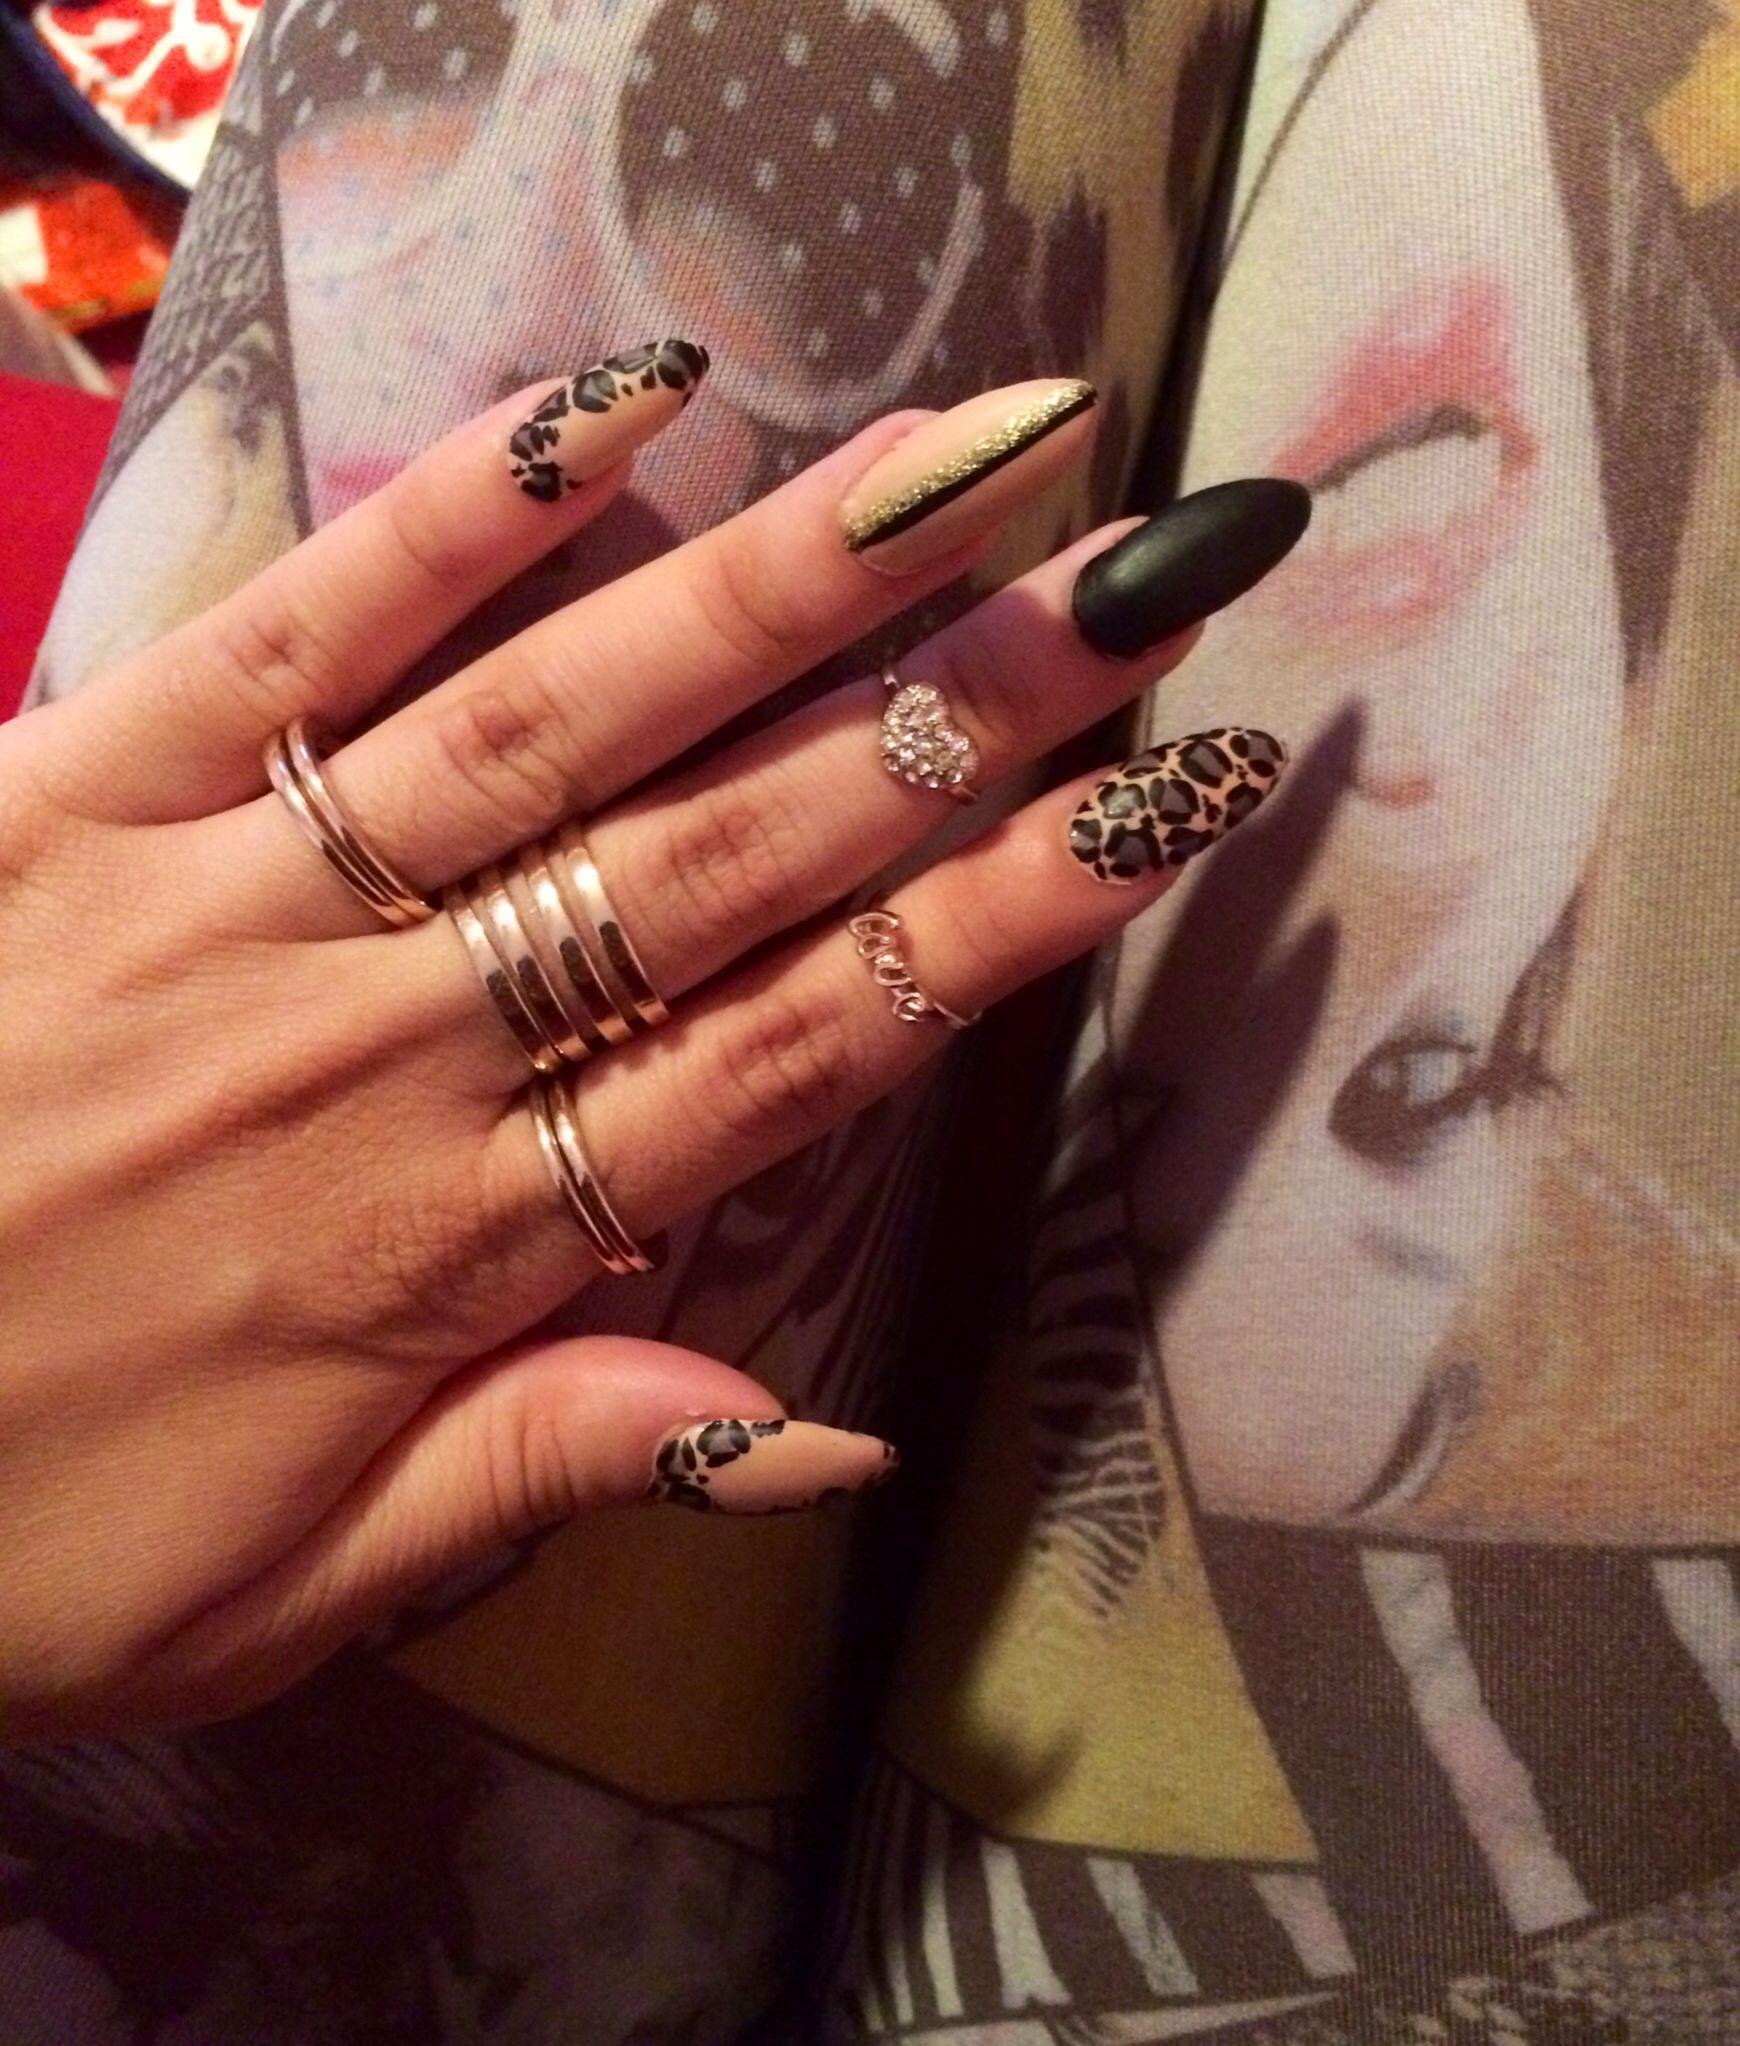 Cheetah and Black Matte Stiletto / Almond acrylic Nails Design | My ...